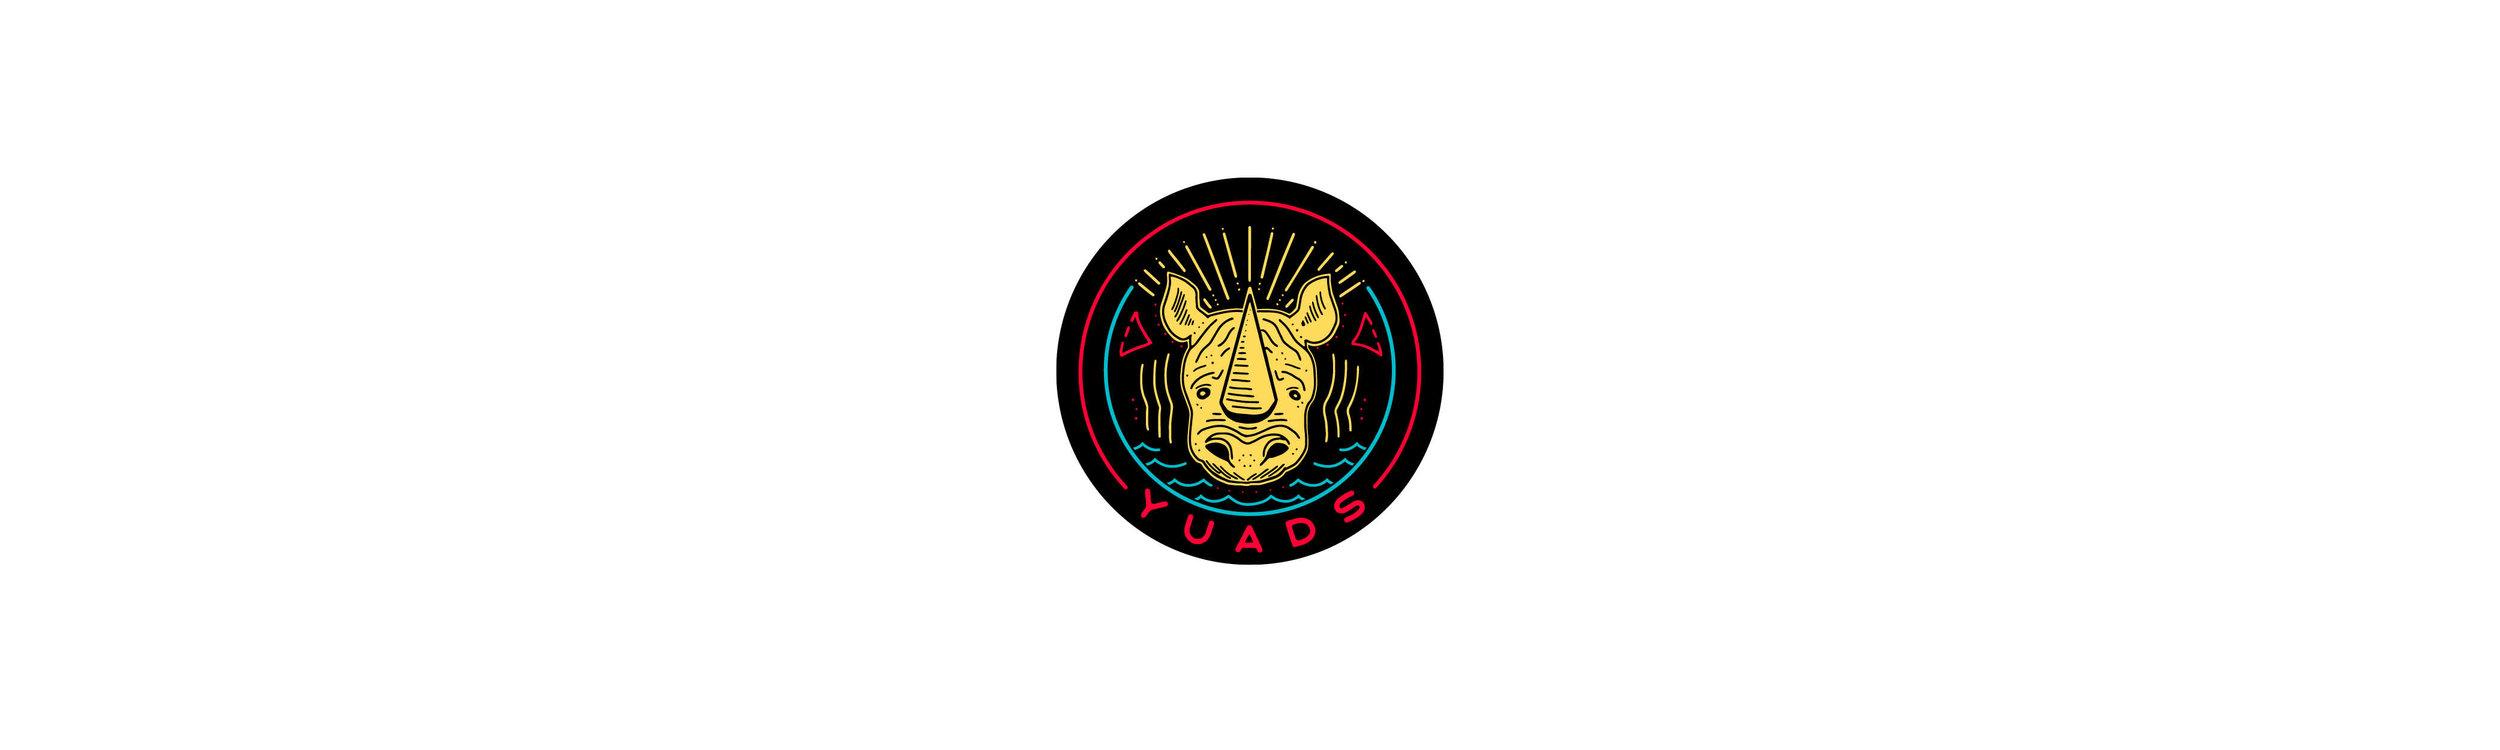 YUADS Branding by Casi Long Design | casilong.com 4.jpg